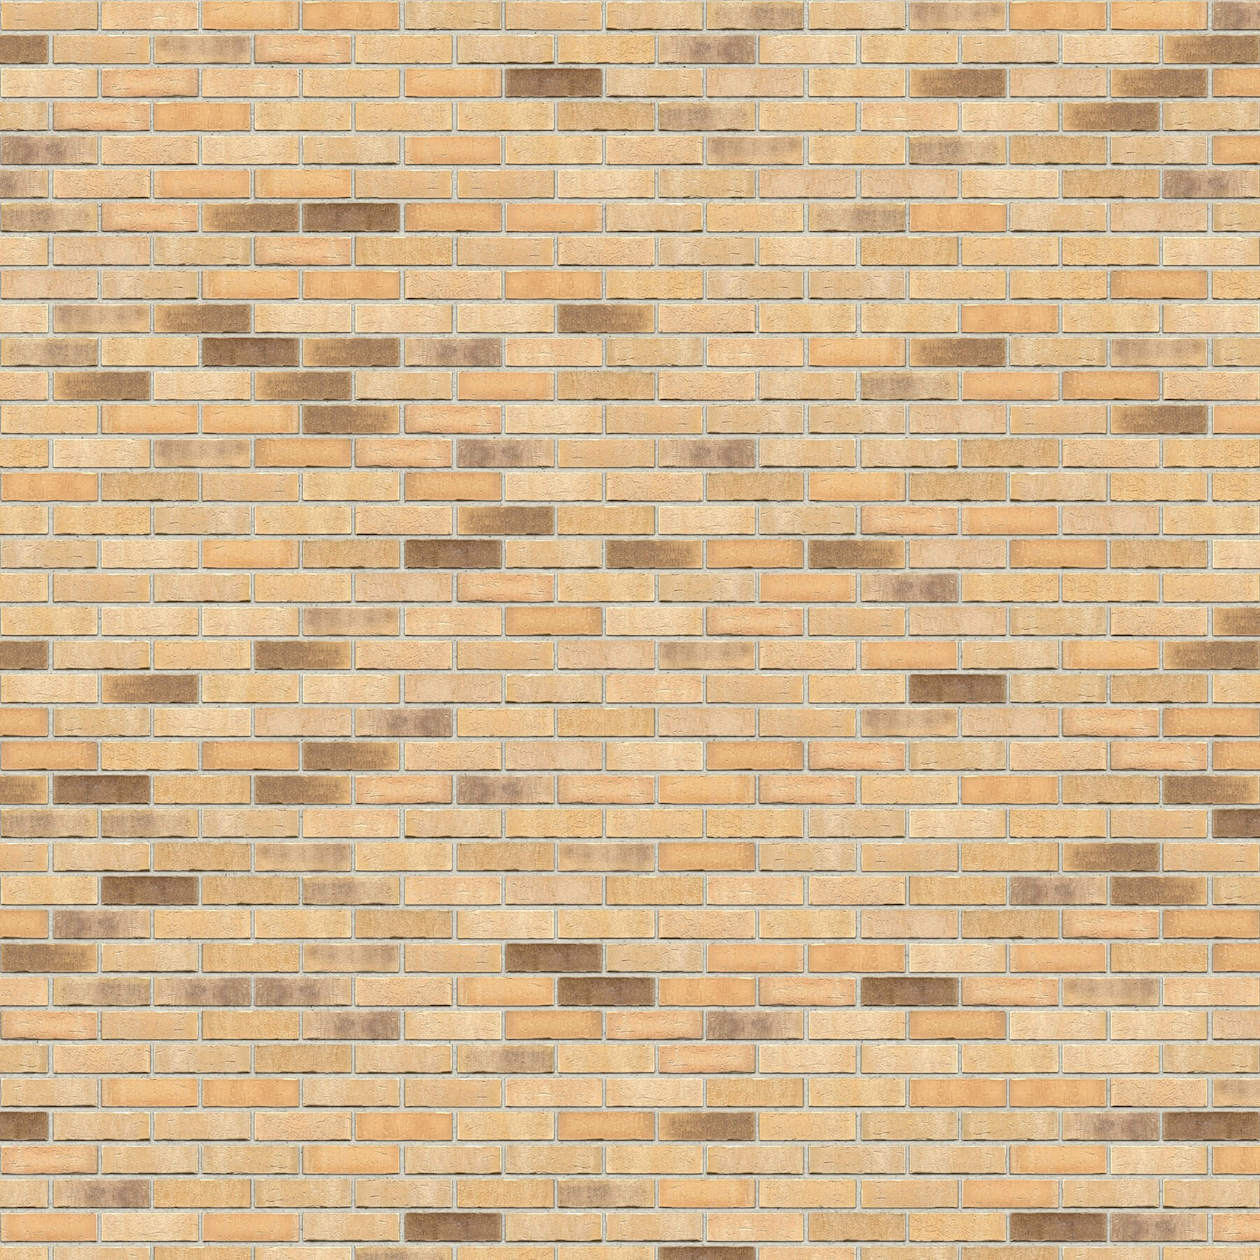 Puna-cigla-FeldHaus-Klinker-brick-house-Beograd-nf-k-723-Bela Fuga